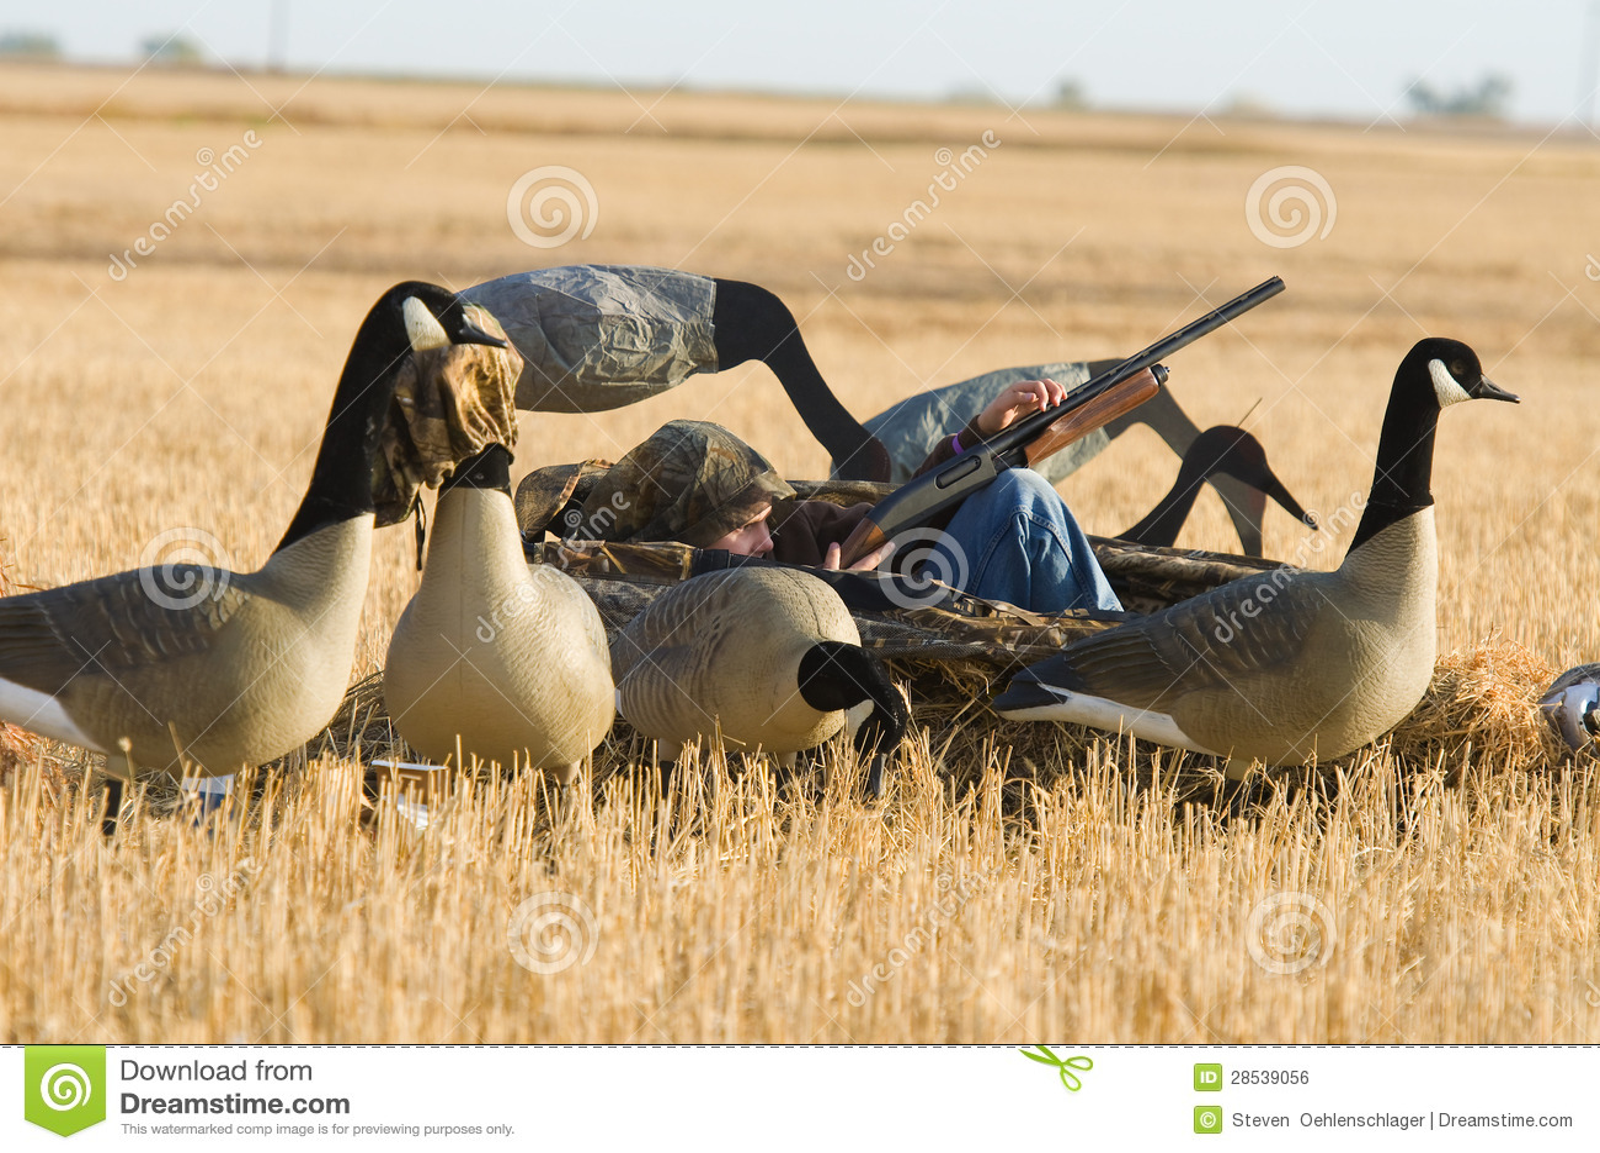 Boy Goose Hunting